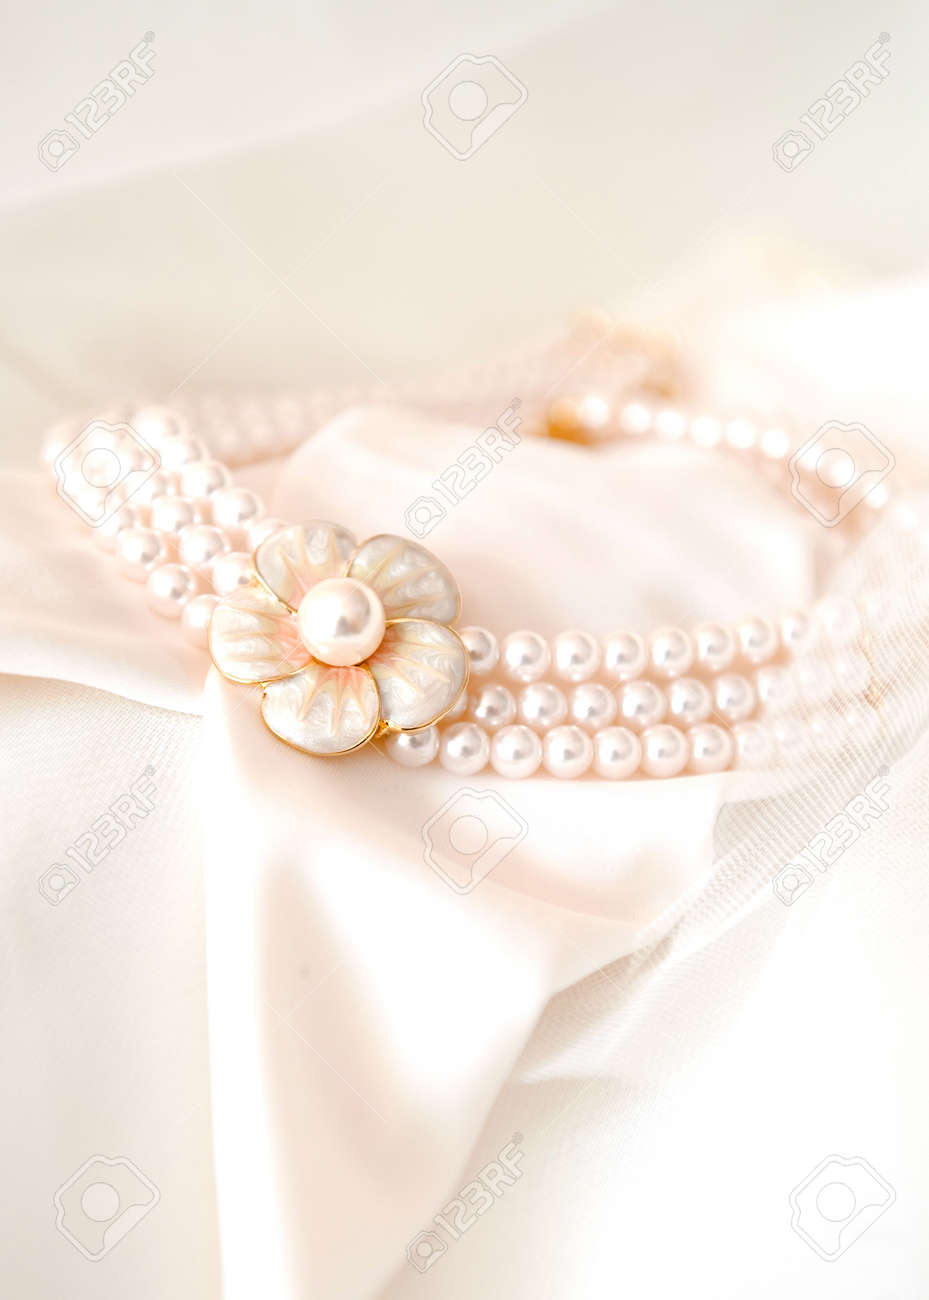 beautiful bridal necklace on pink background Stock Photo - 7722487